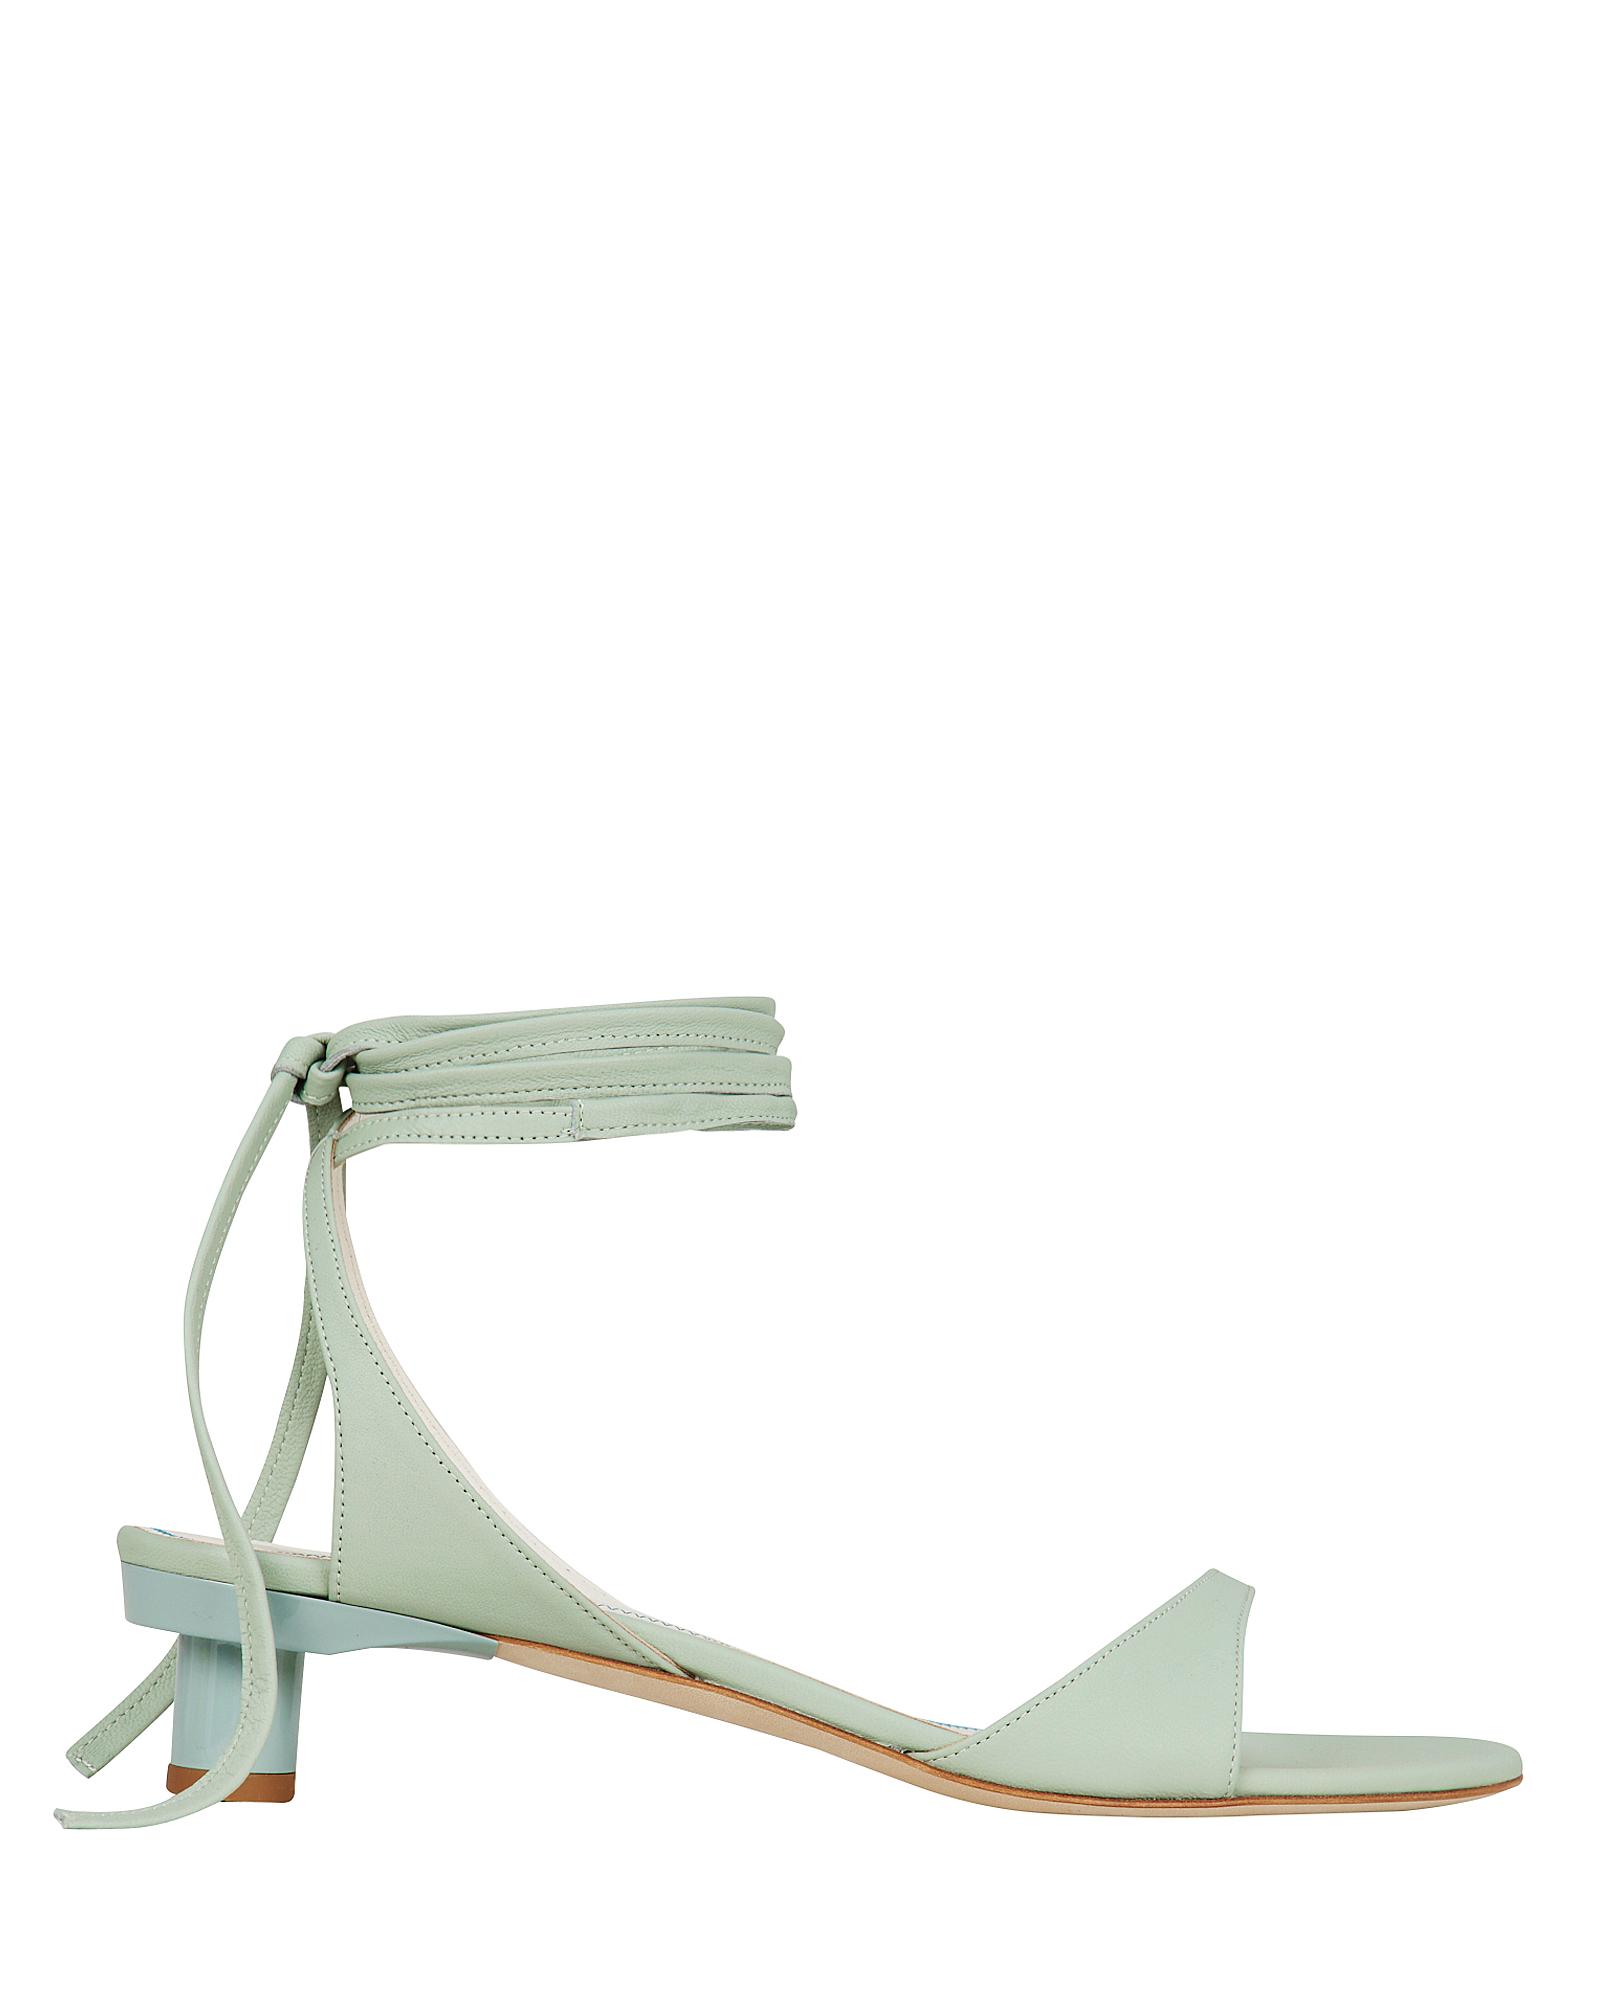 Tibi Sandals Scott Leather Sandals